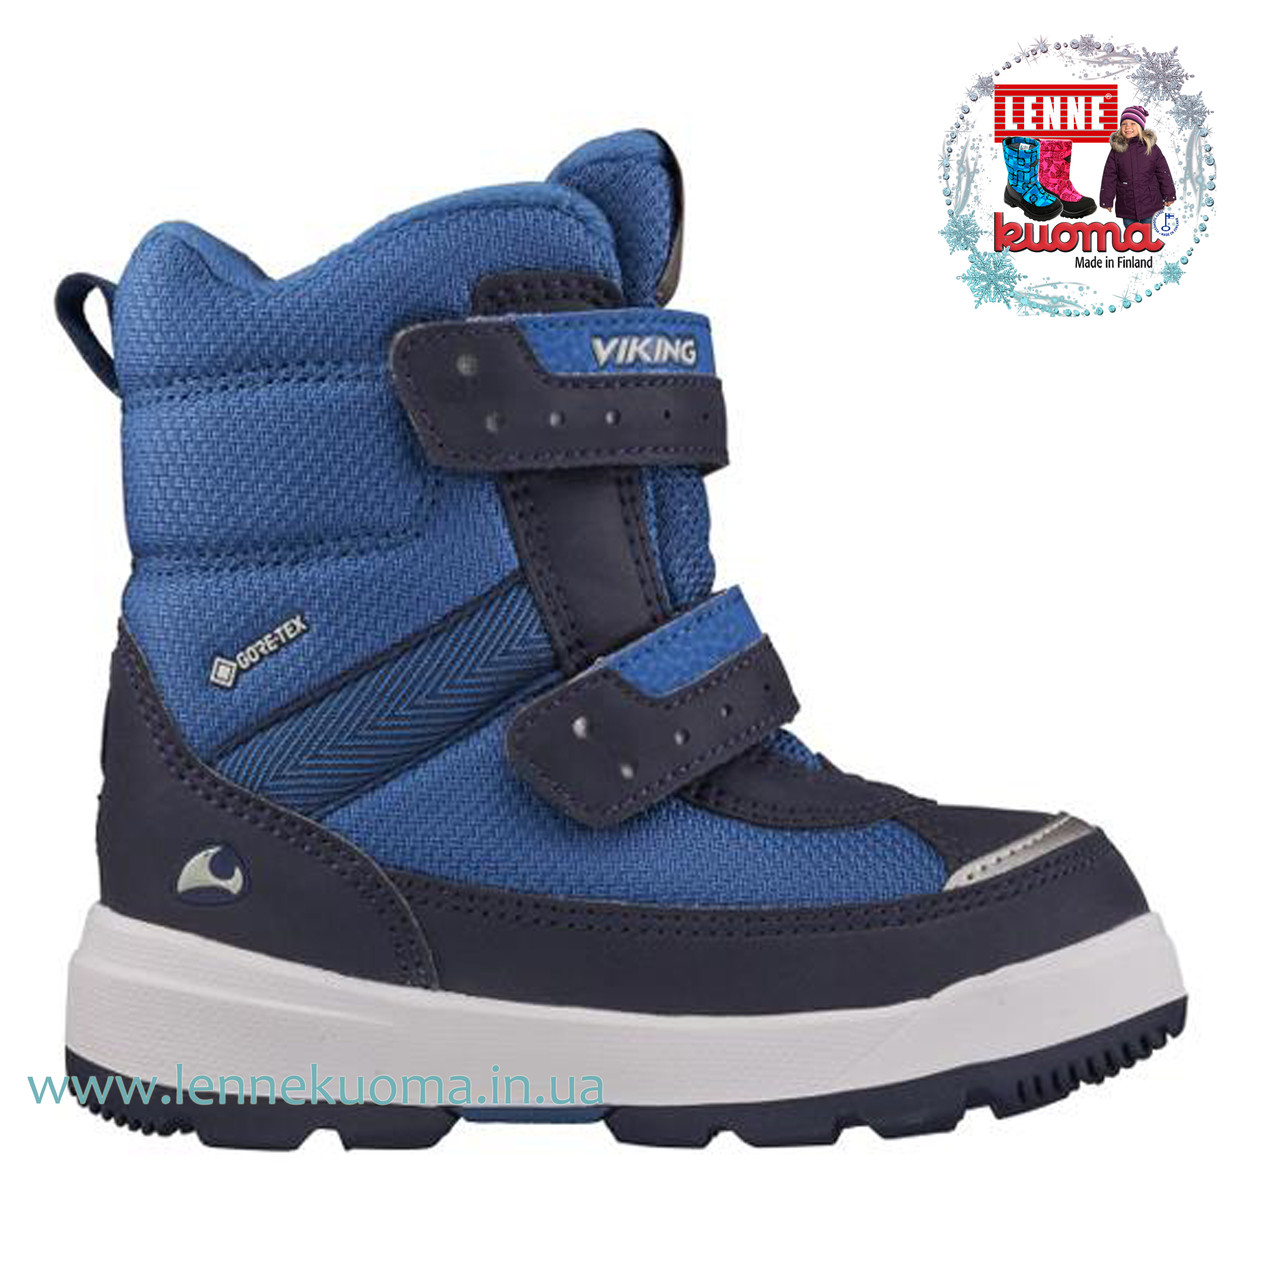 VIKING PLAY II GORE TEX зимние ботинки. Размеры 22-33